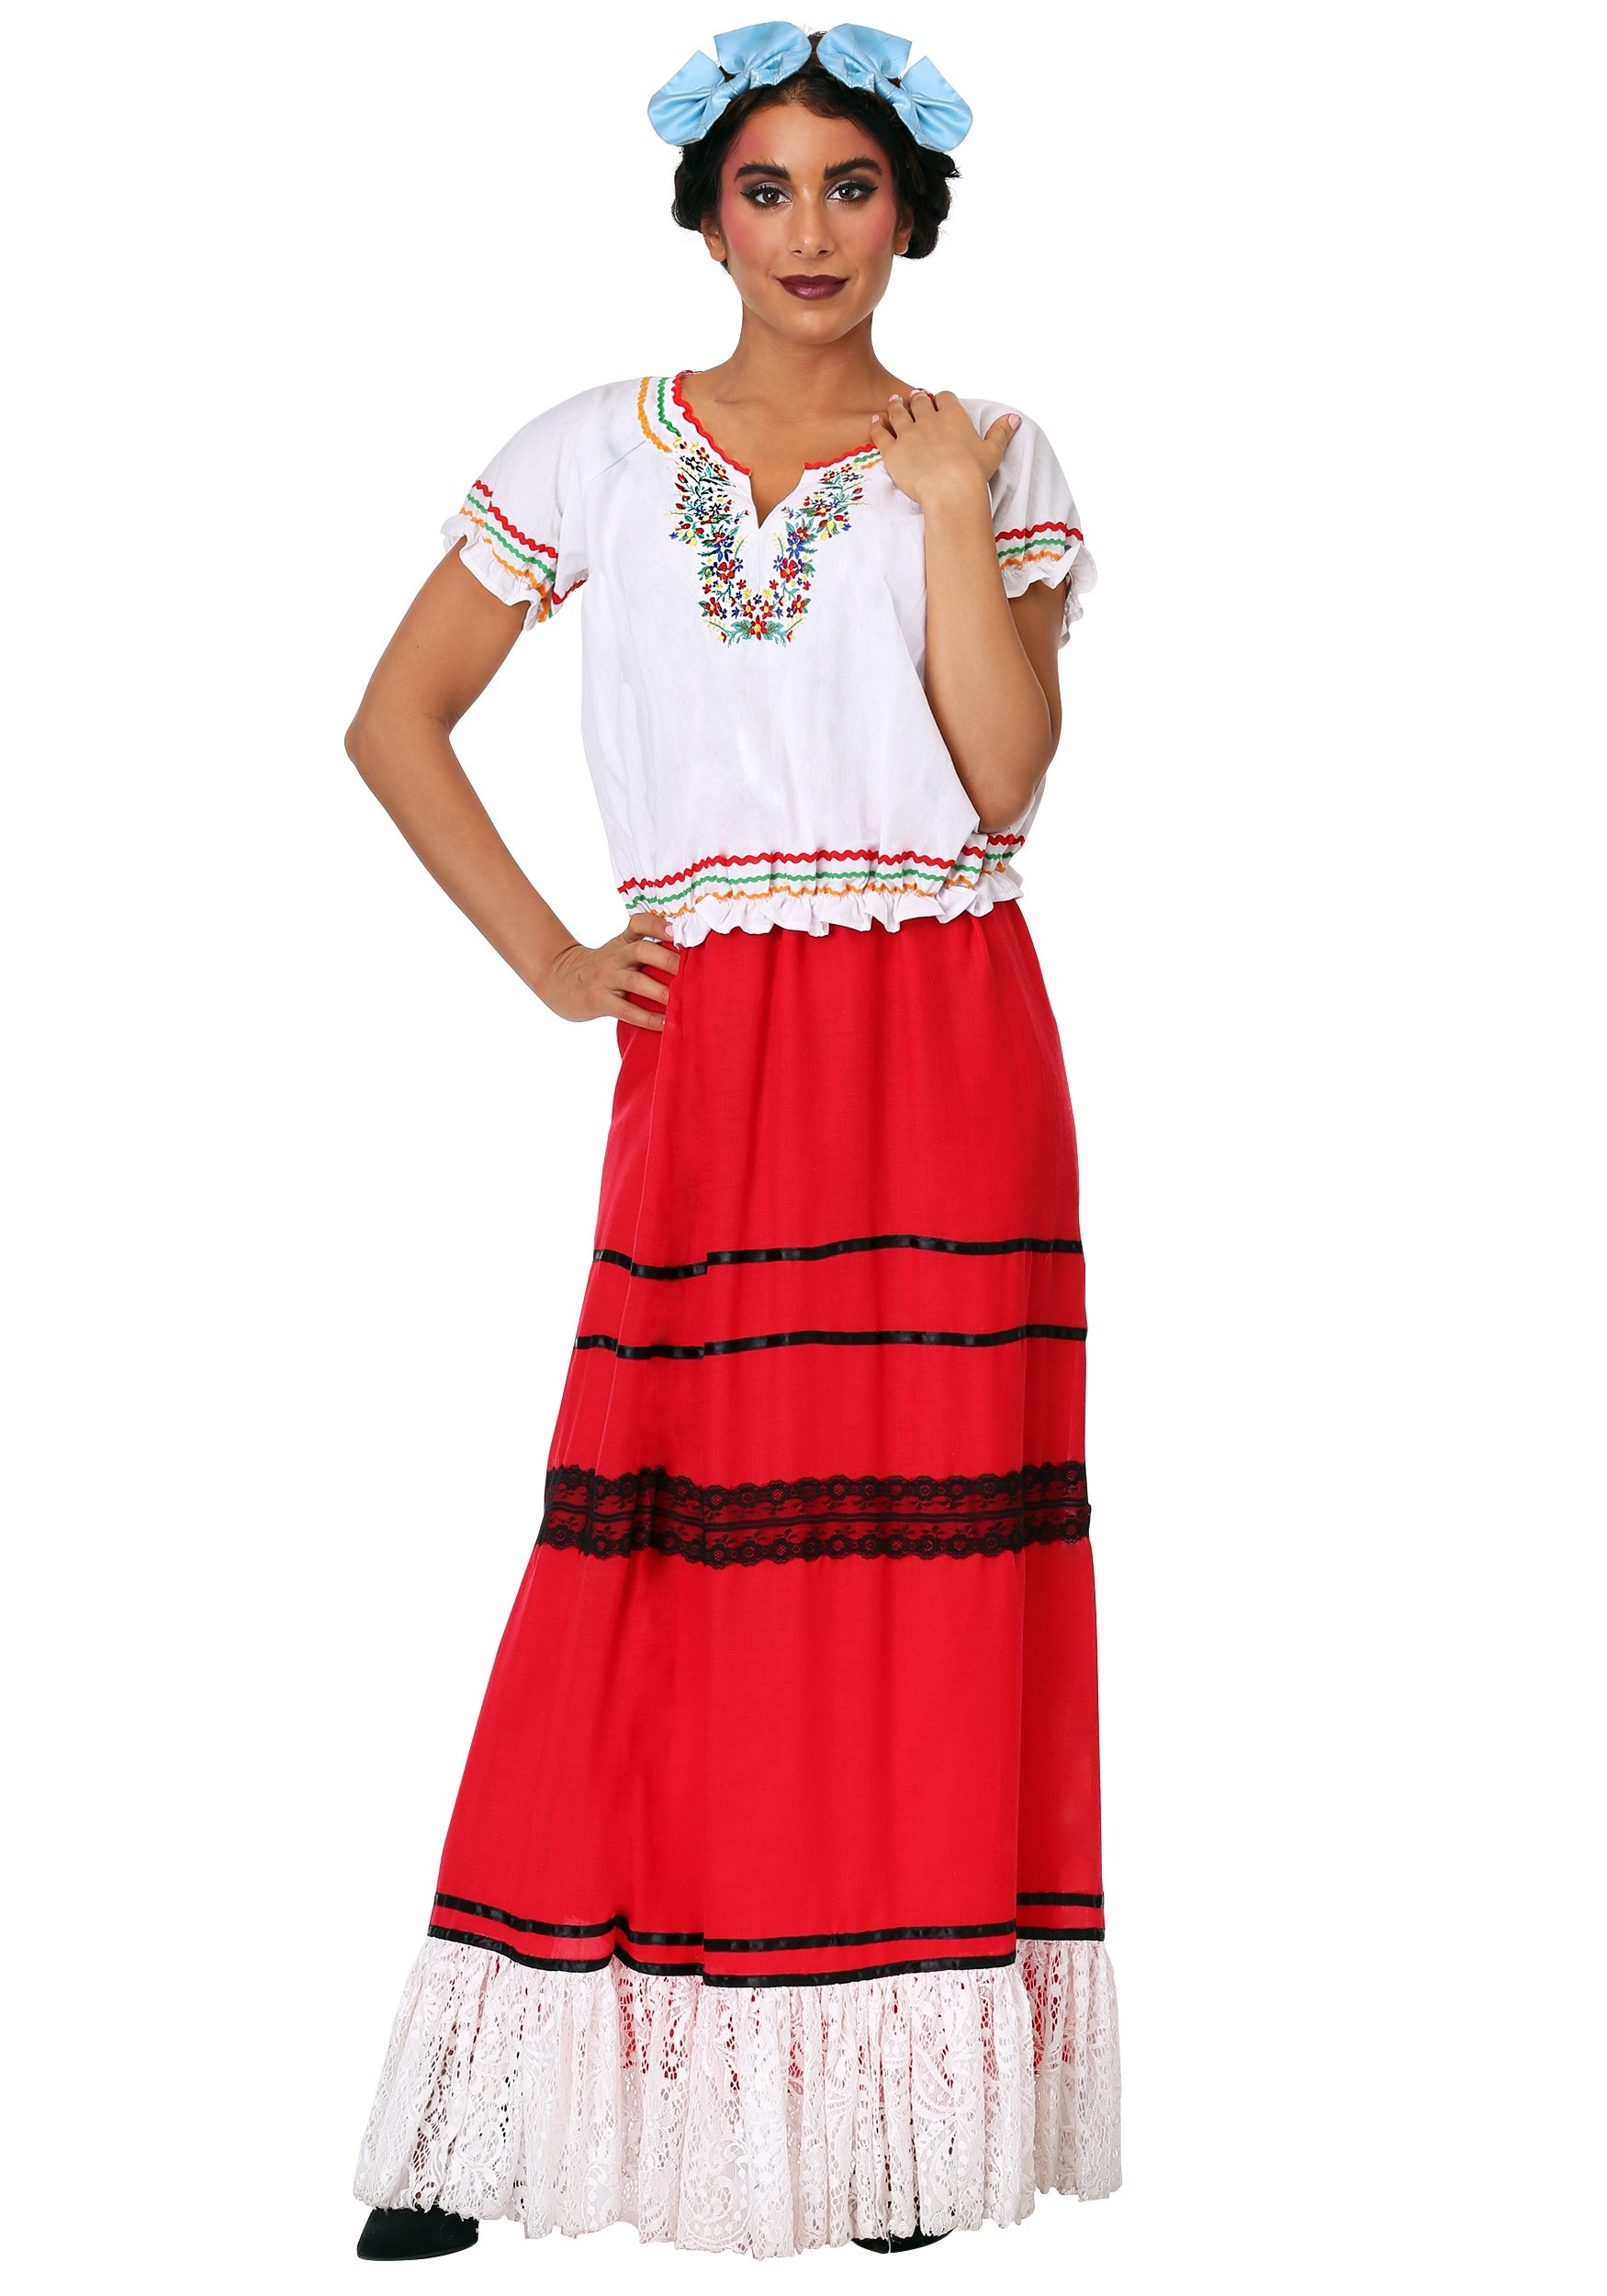 Red Frida Kahlo Womens Costume